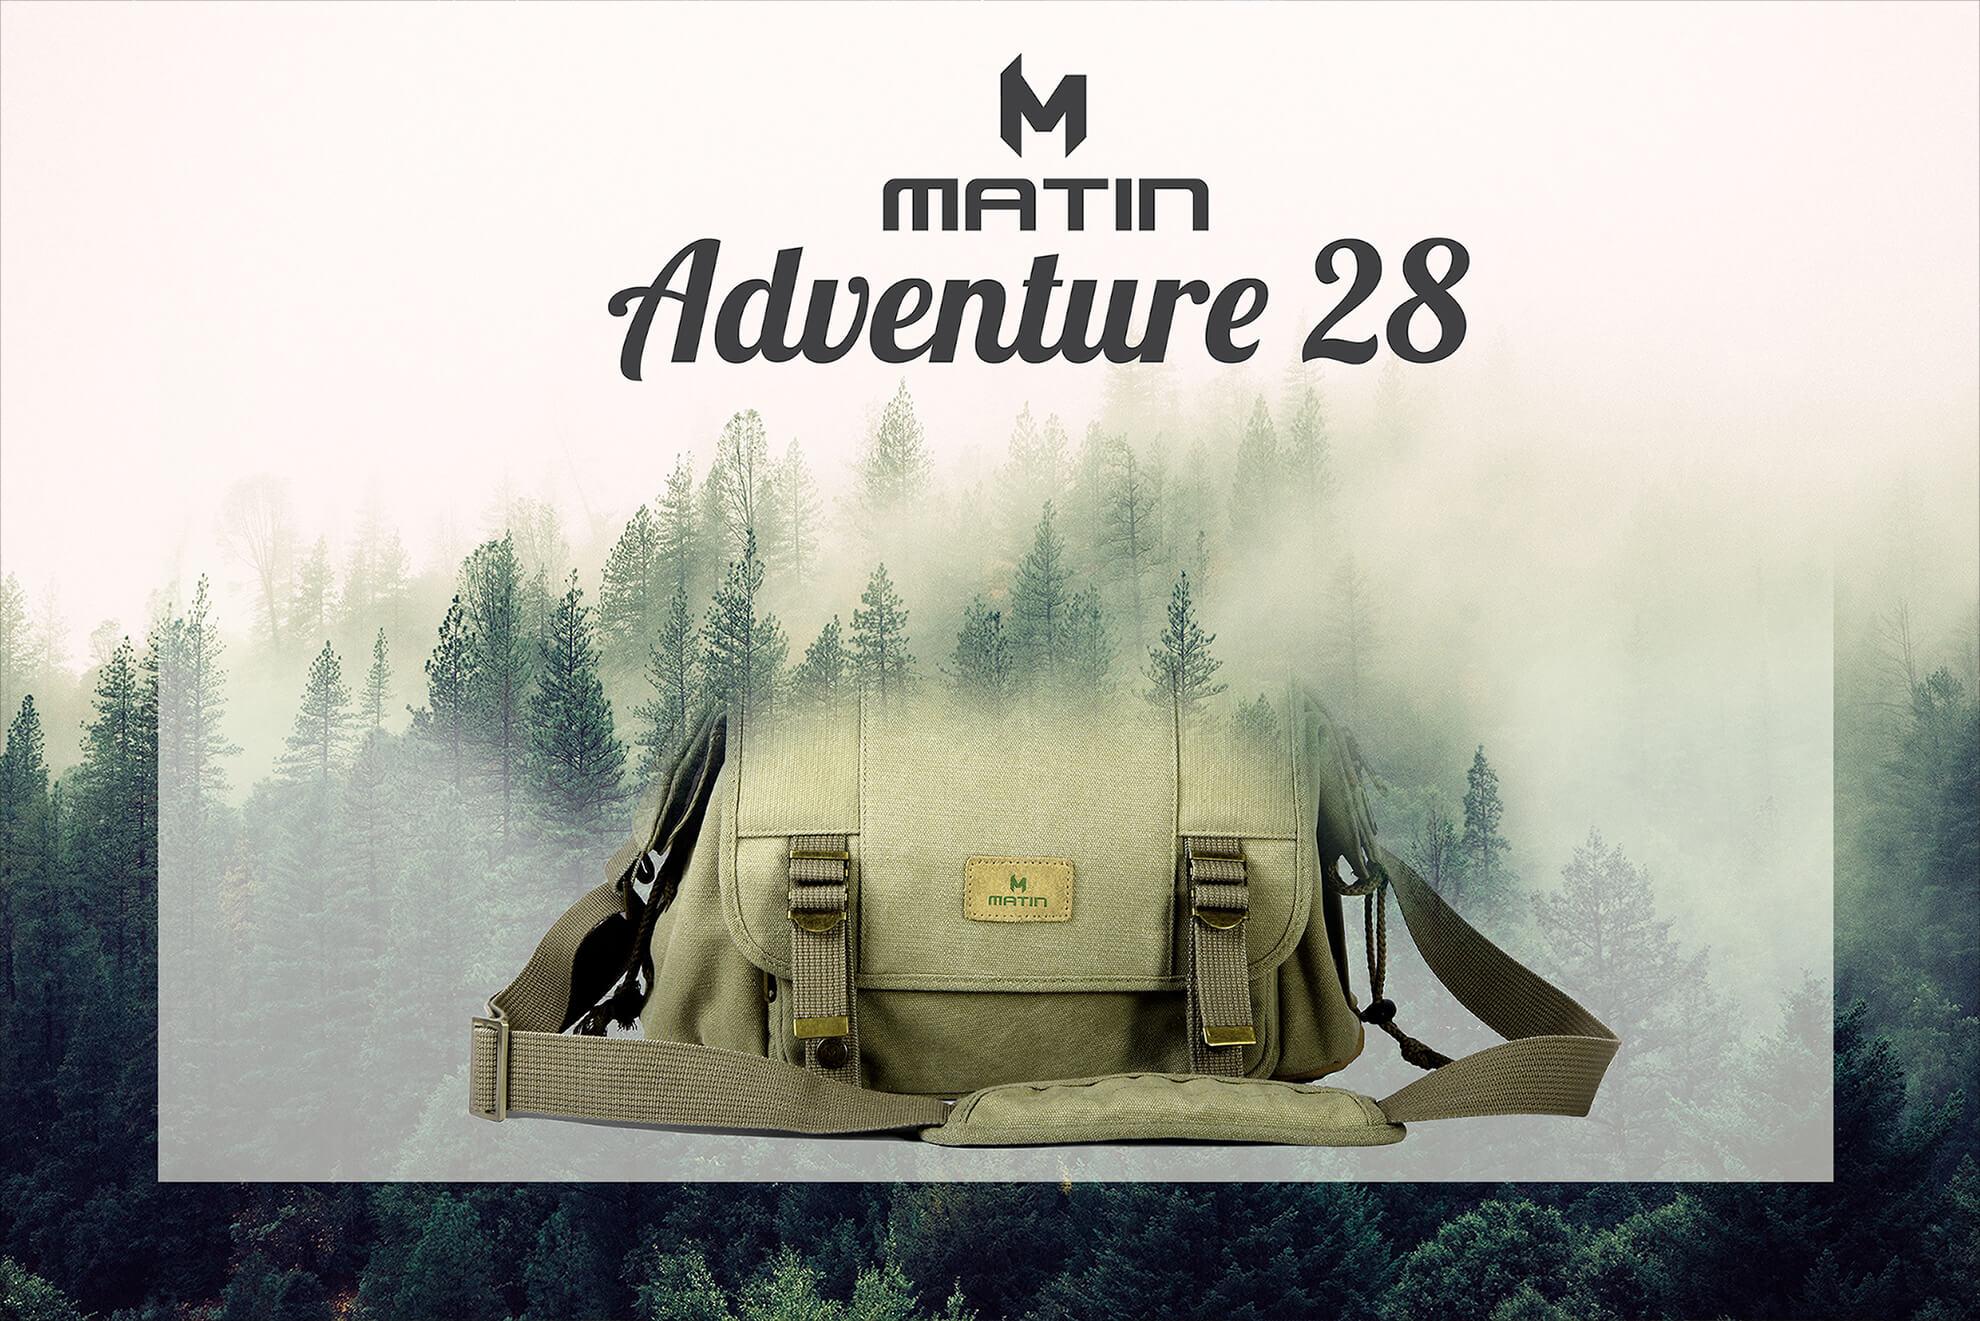 Matin M-11601 Adventure 28